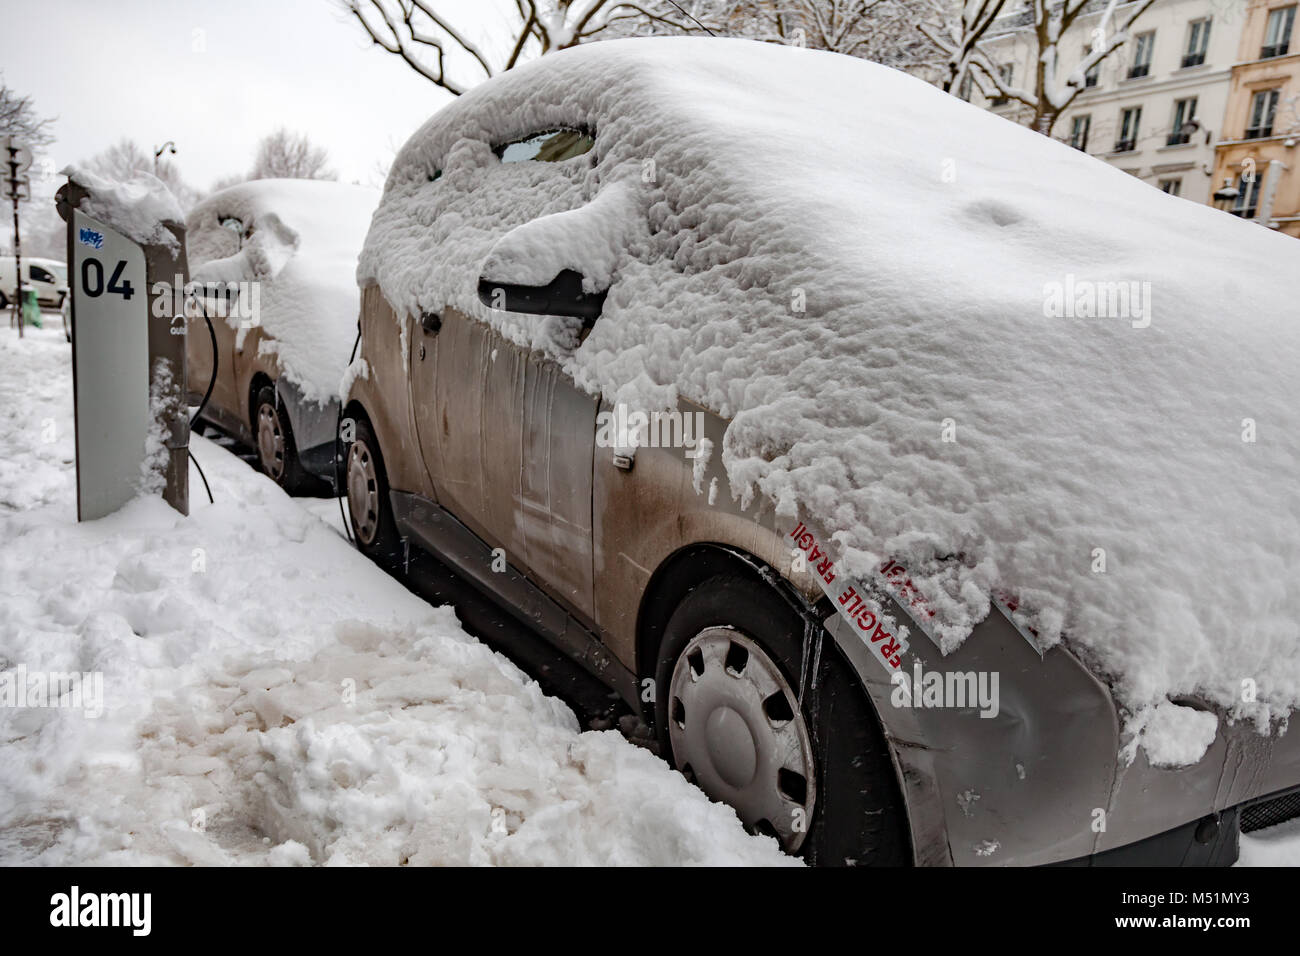 Autolib carsharing car stuck under the snow in Paris - Stock Image